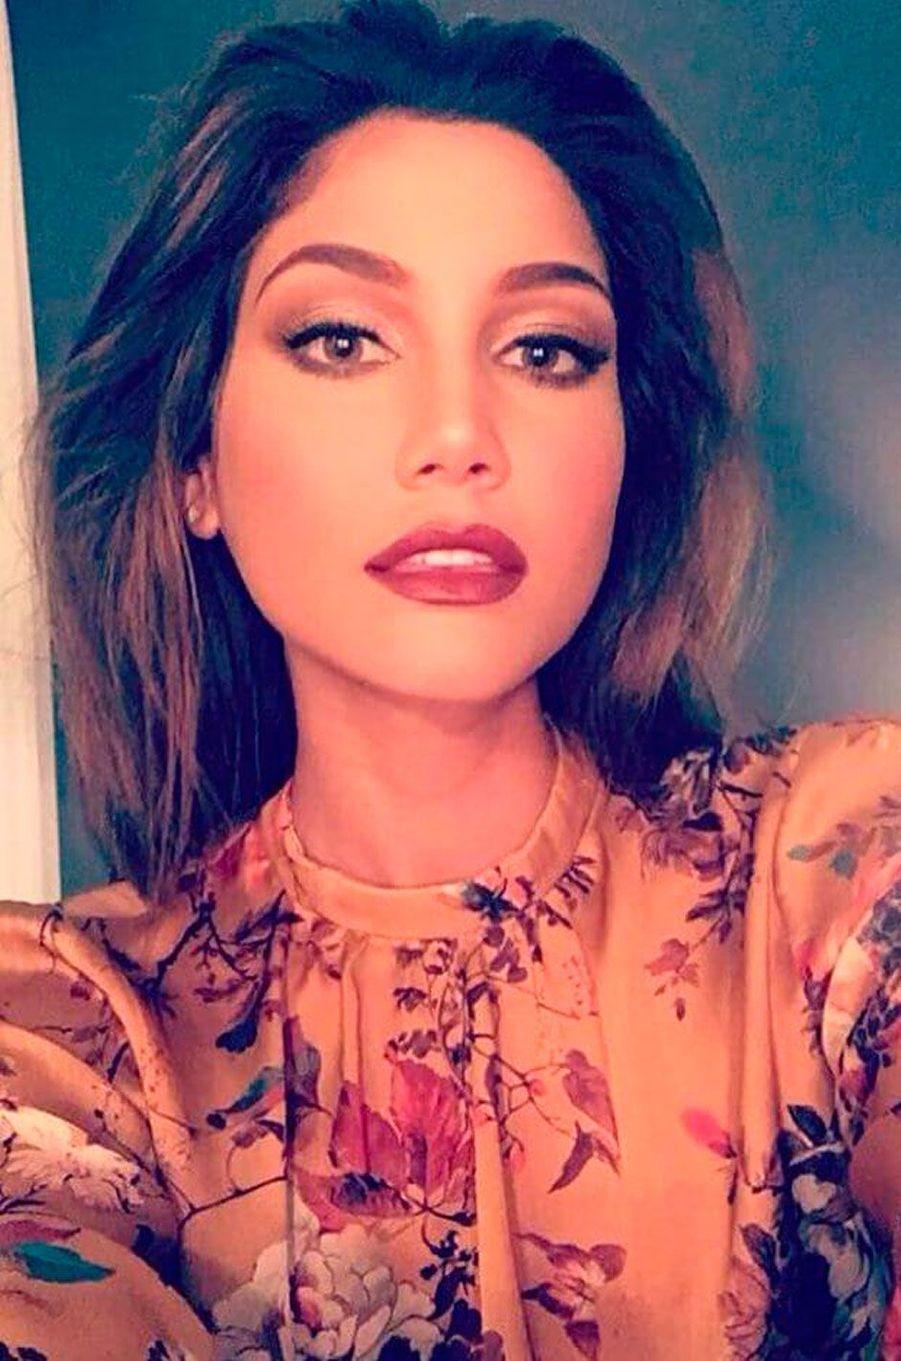 Miss Panama, Keity Drennan